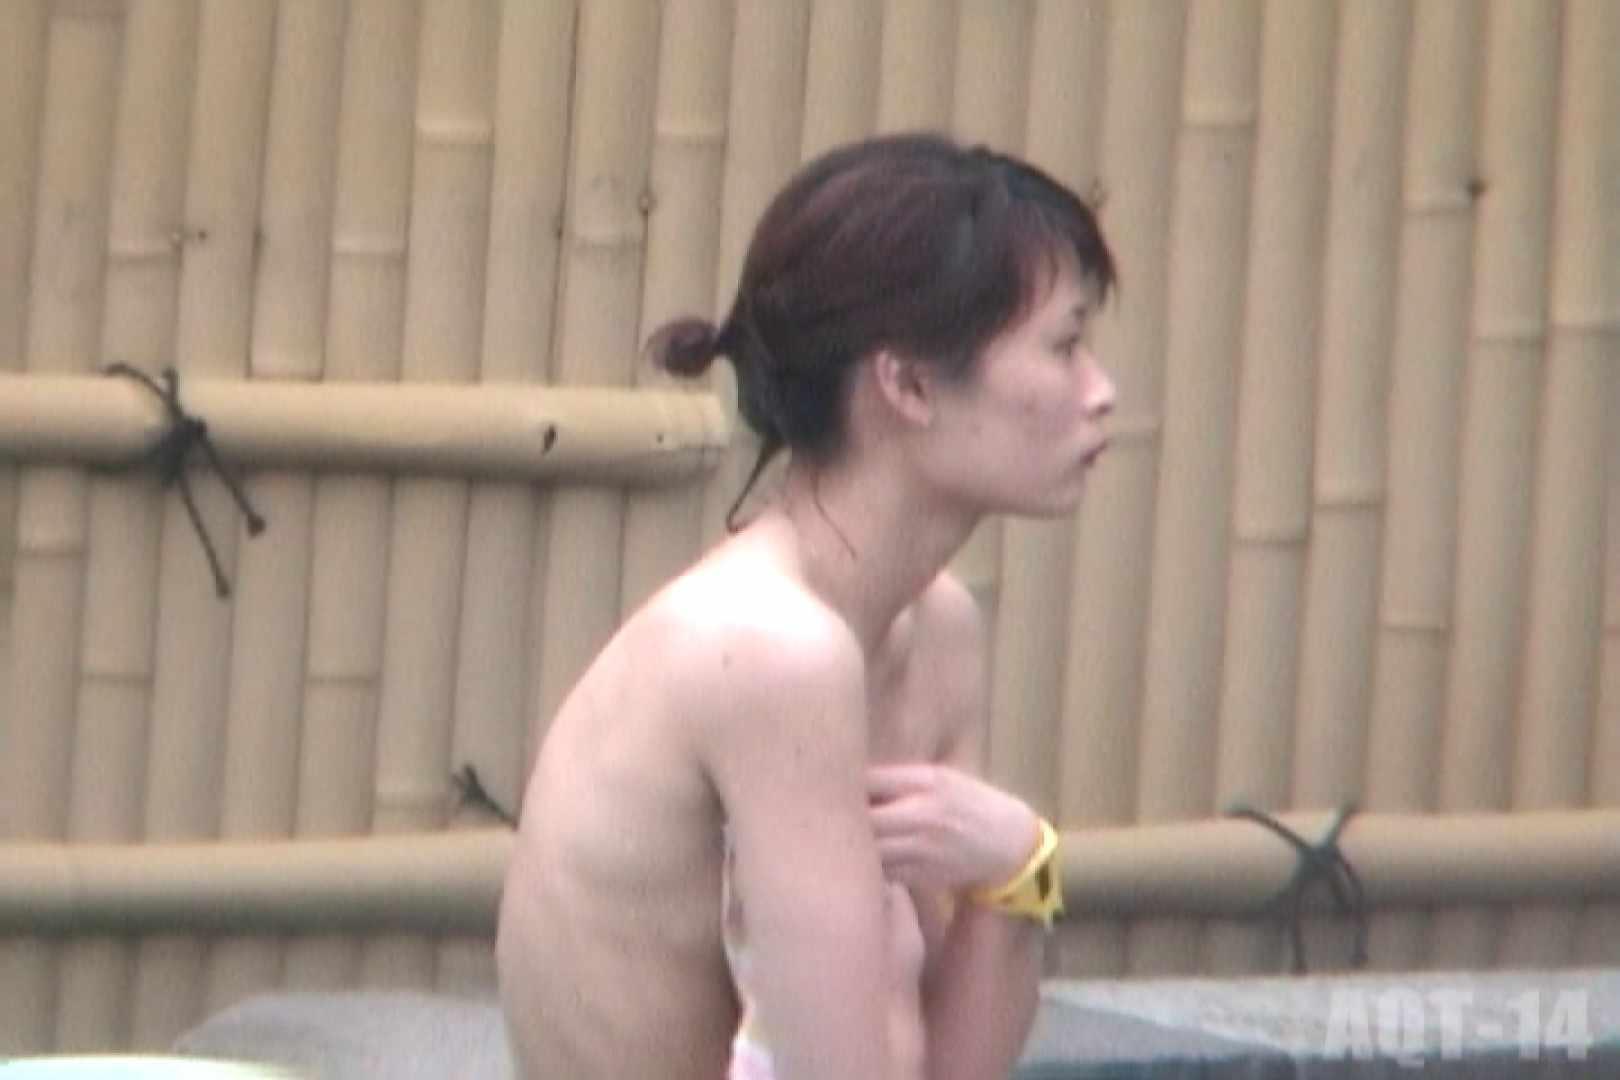 Aquaな露天風呂Vol.822 盗撮大放出 エロ無料画像 98連発 50